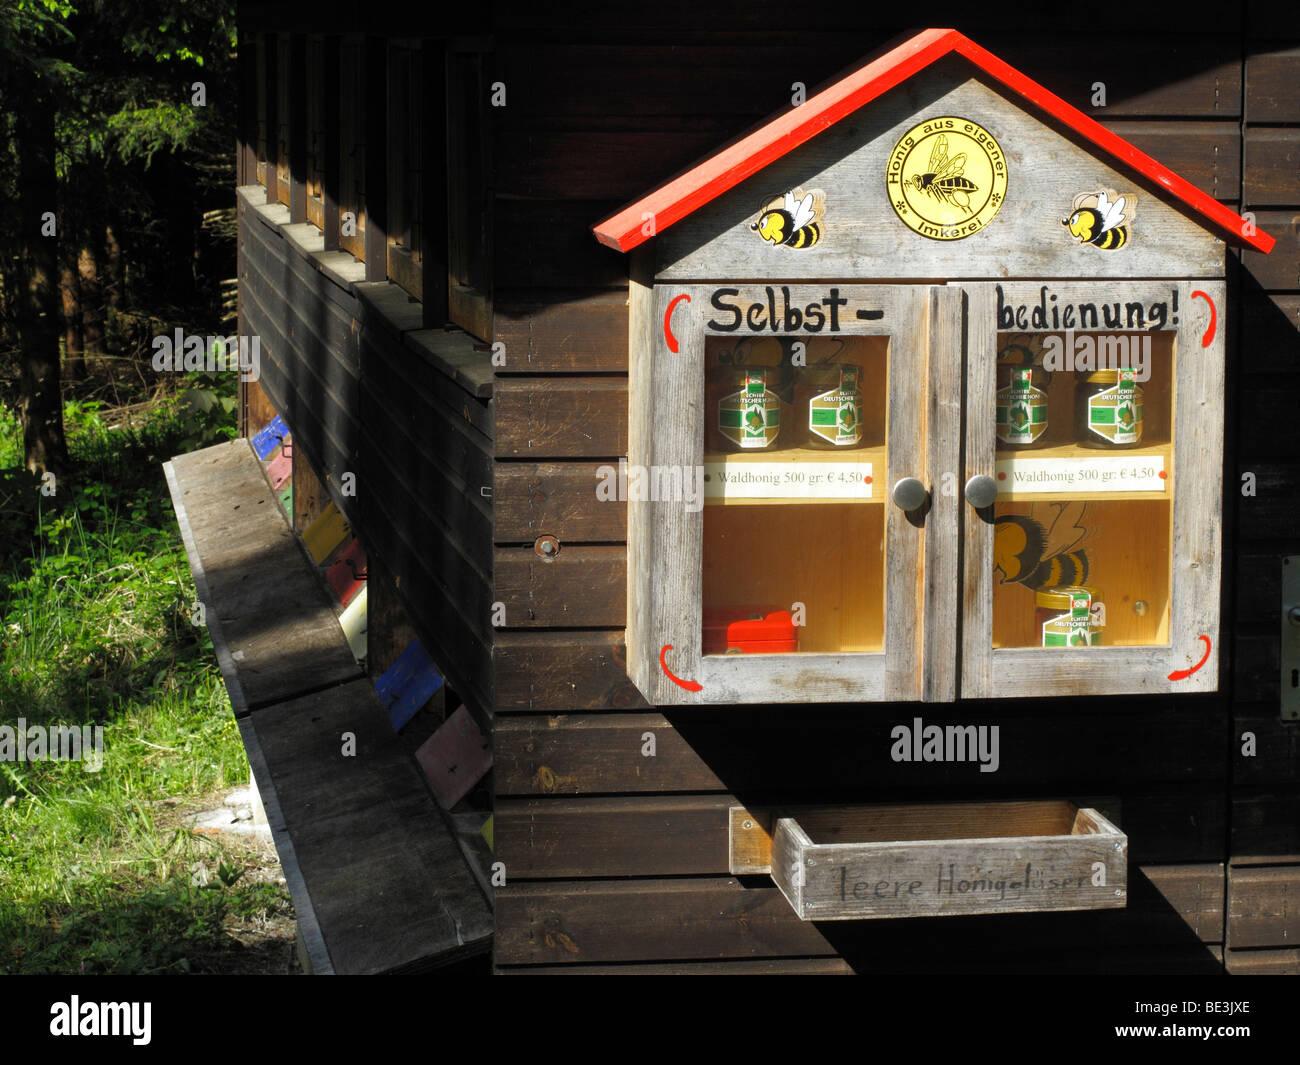 Beehouse with self service for honey, Koenigsdorf, Upper Bavaria, Bavaria, Germany, Europe - Stock Image